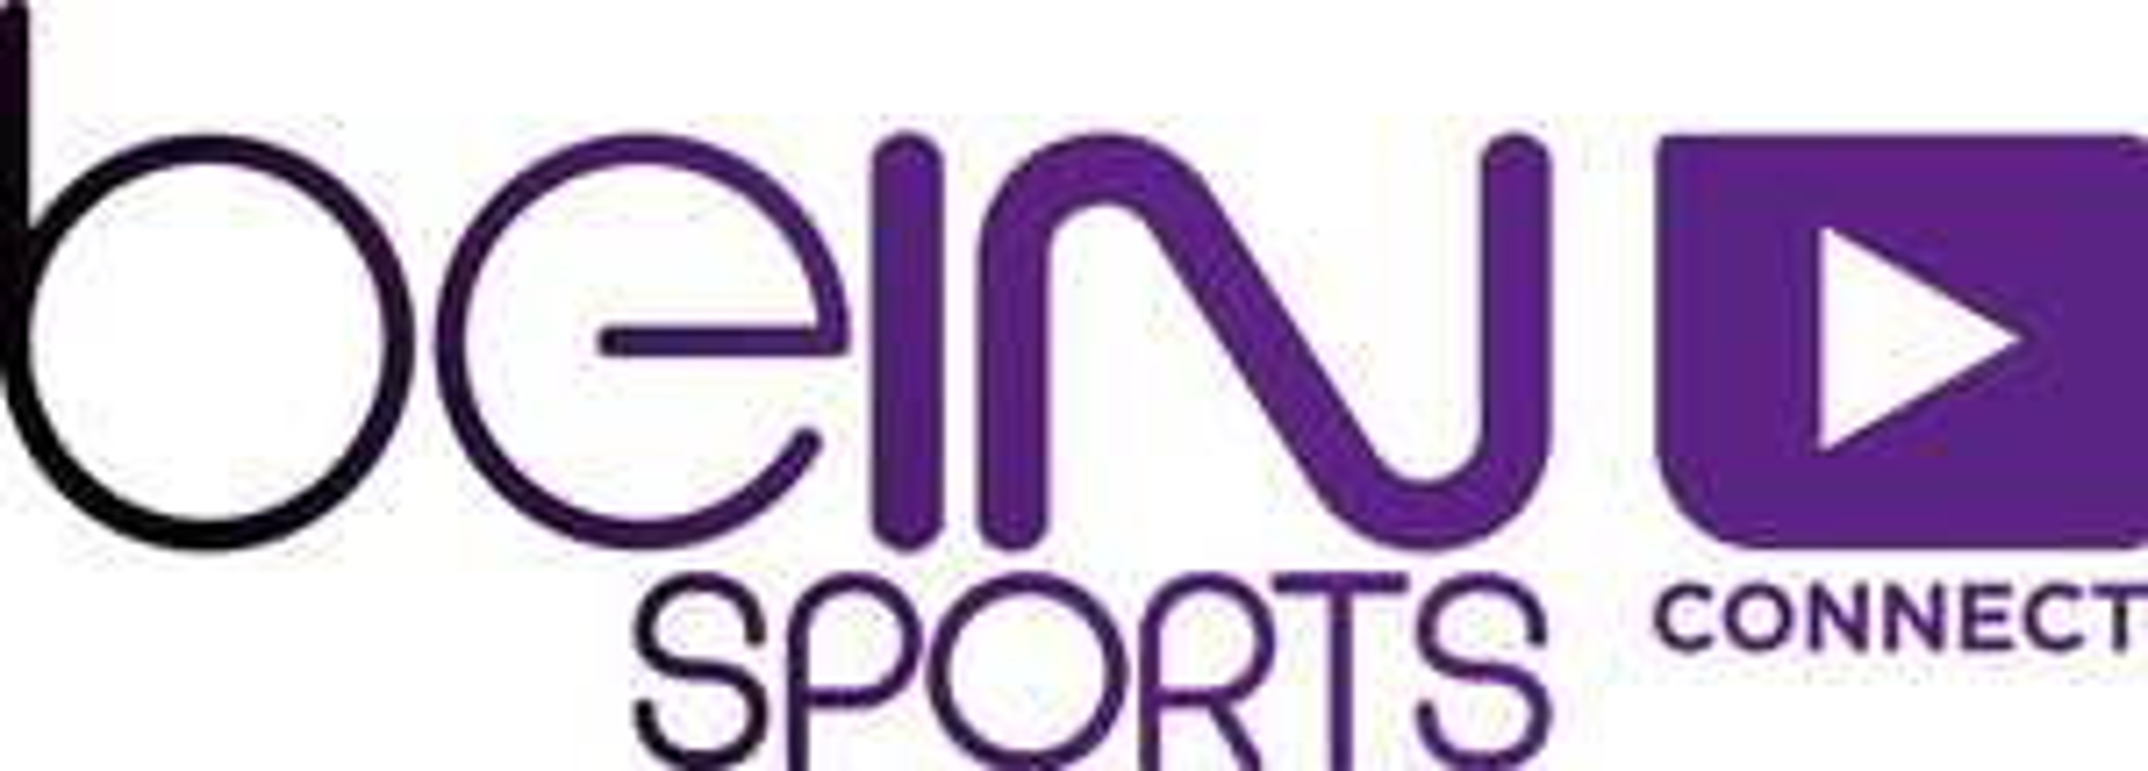 Abonnement beIN Sports Connect - 1 an